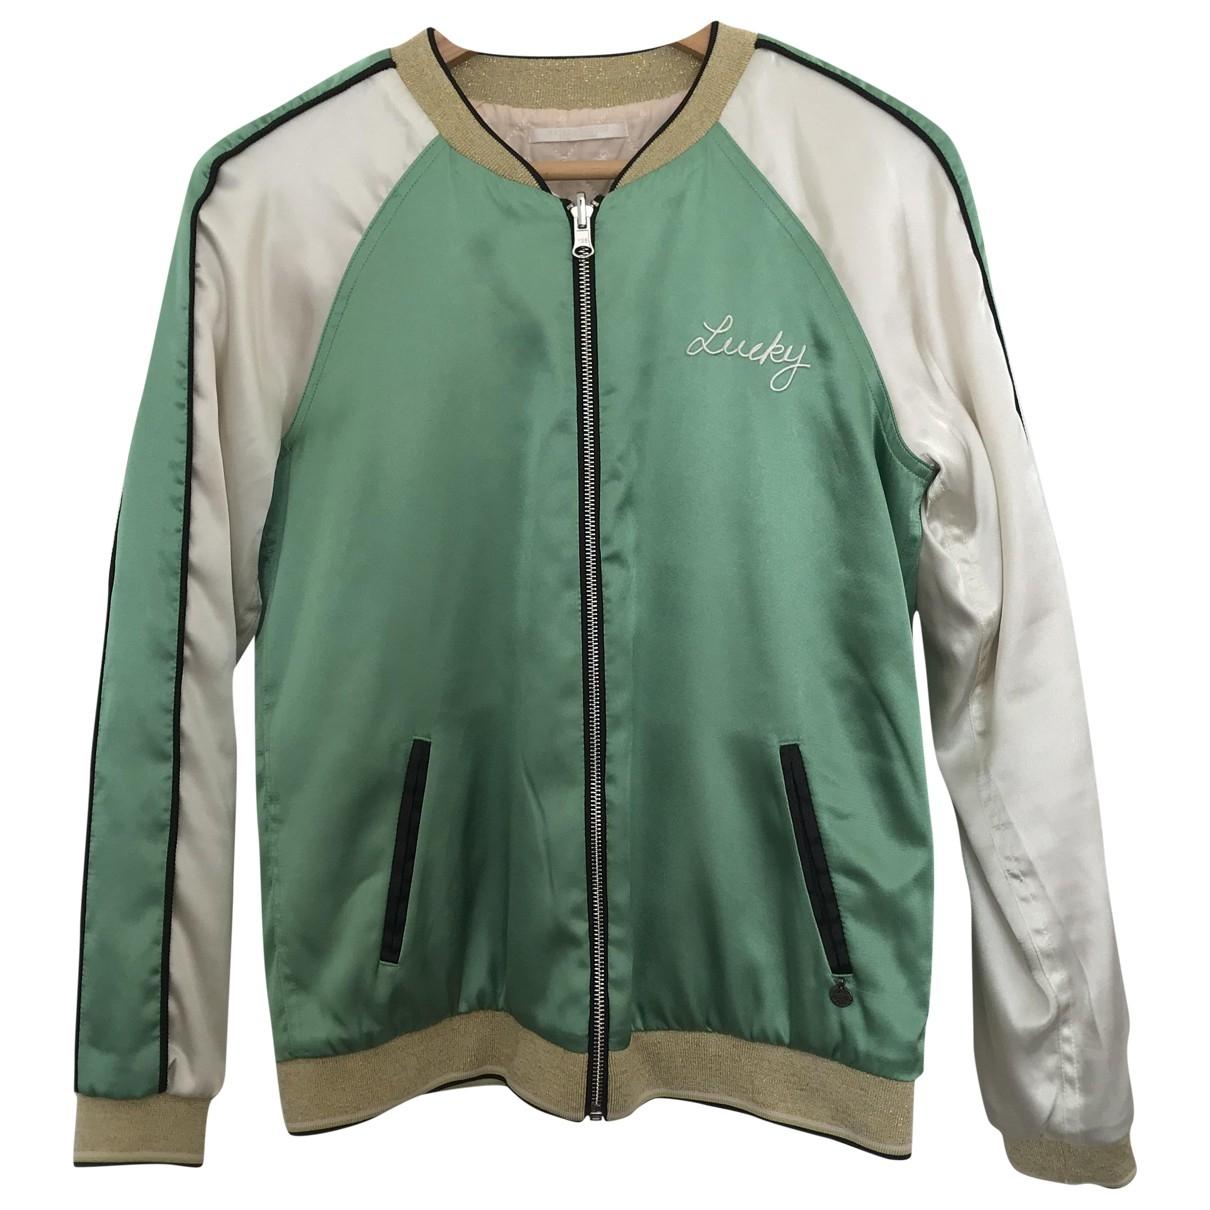 Maison Scotch \N Green jacket for Women S International